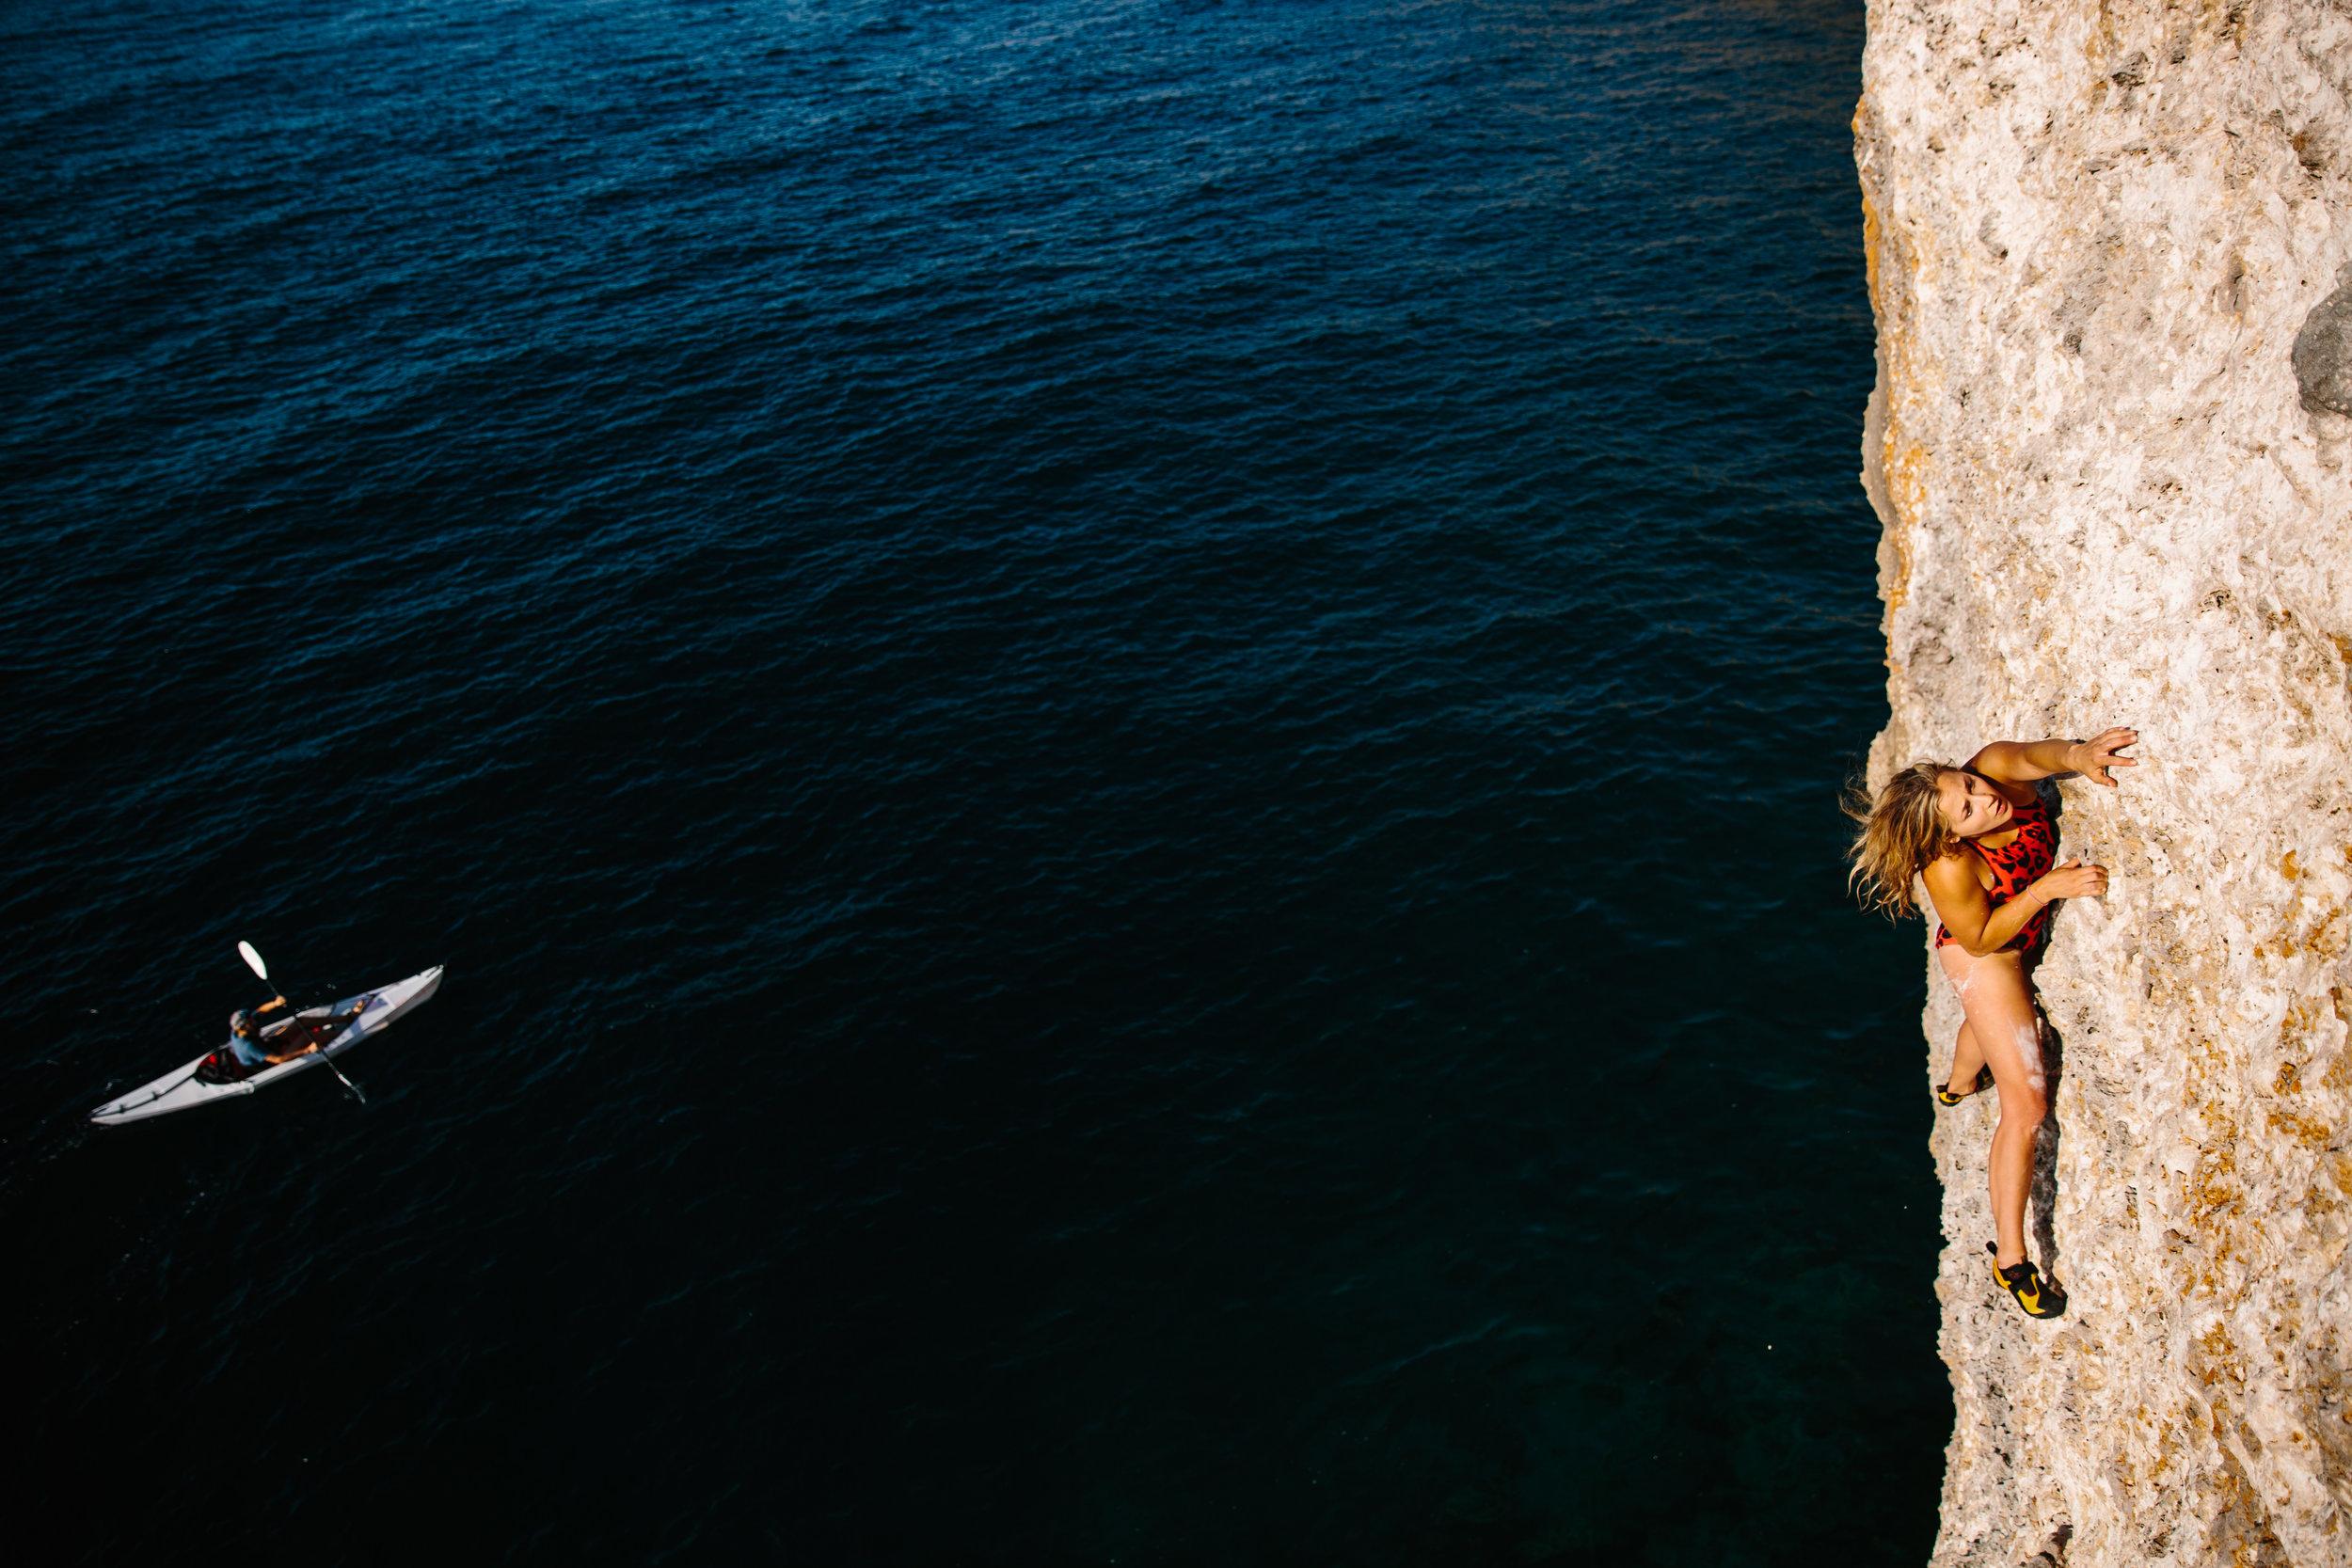 Sasha DiGiulian climbing Indonesia